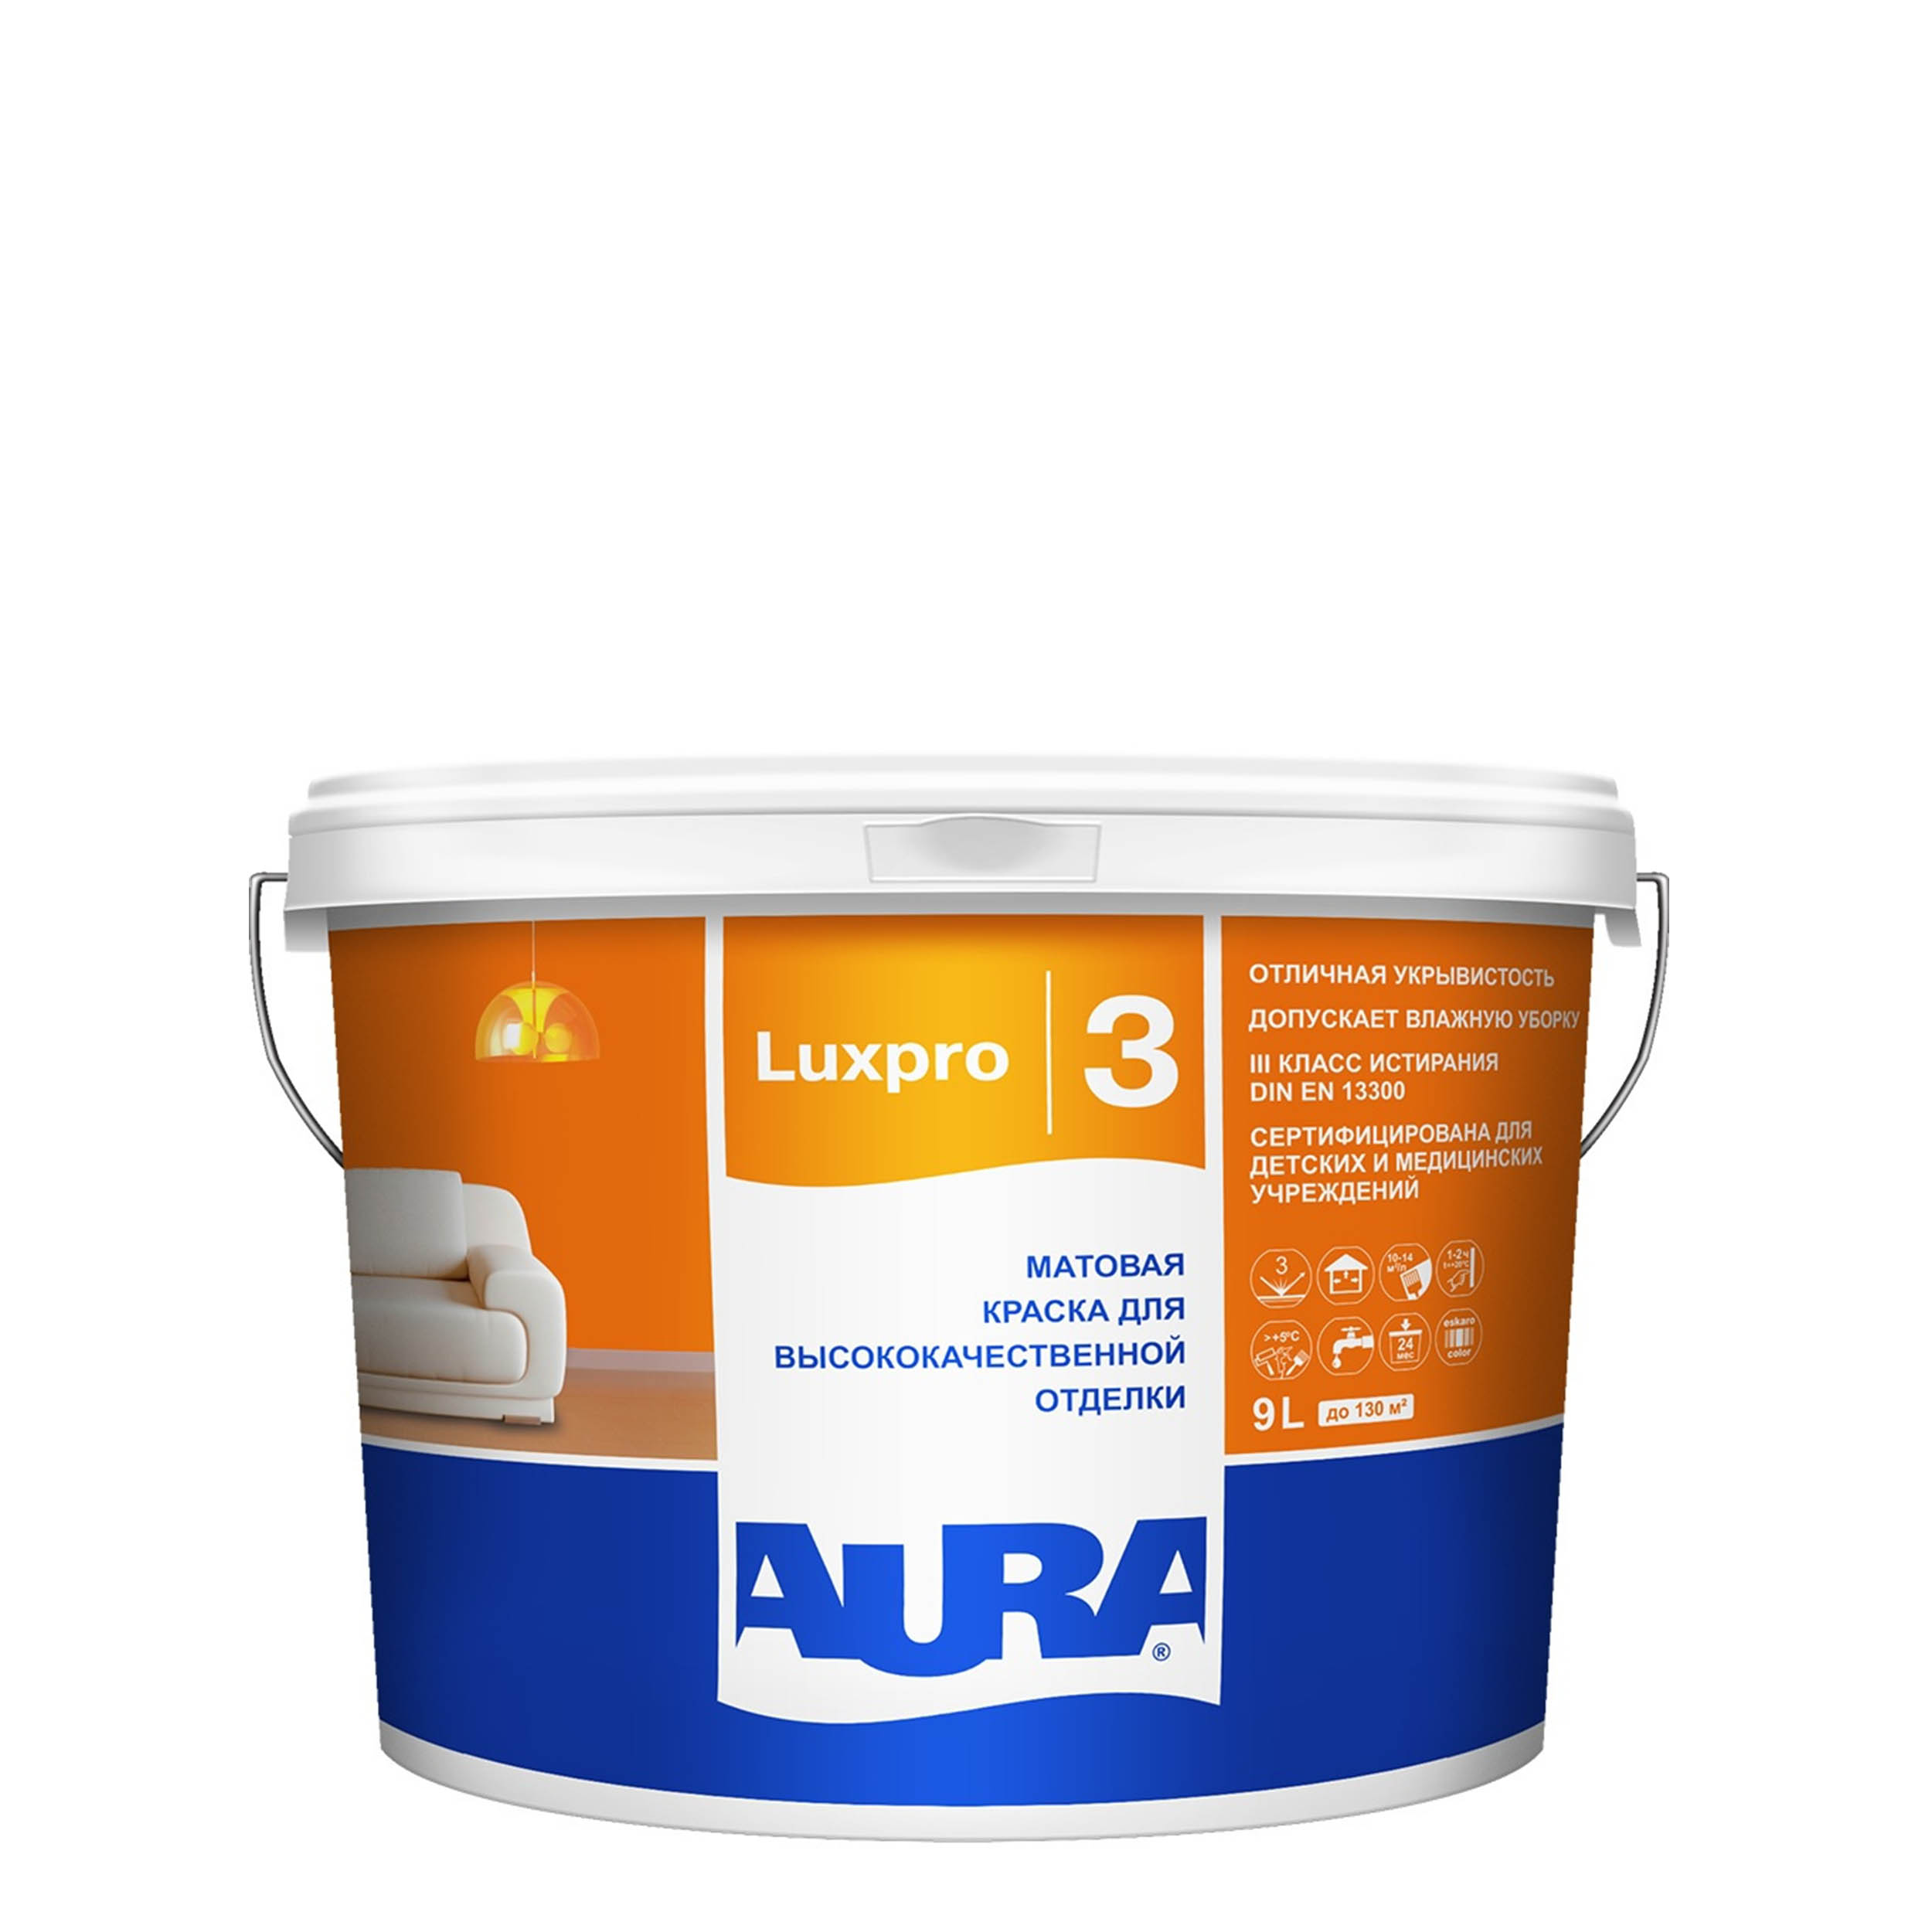 Фото 3 - Краска интерьерная, Aura LuxPRO 3, RAL 3002, 11 кг.